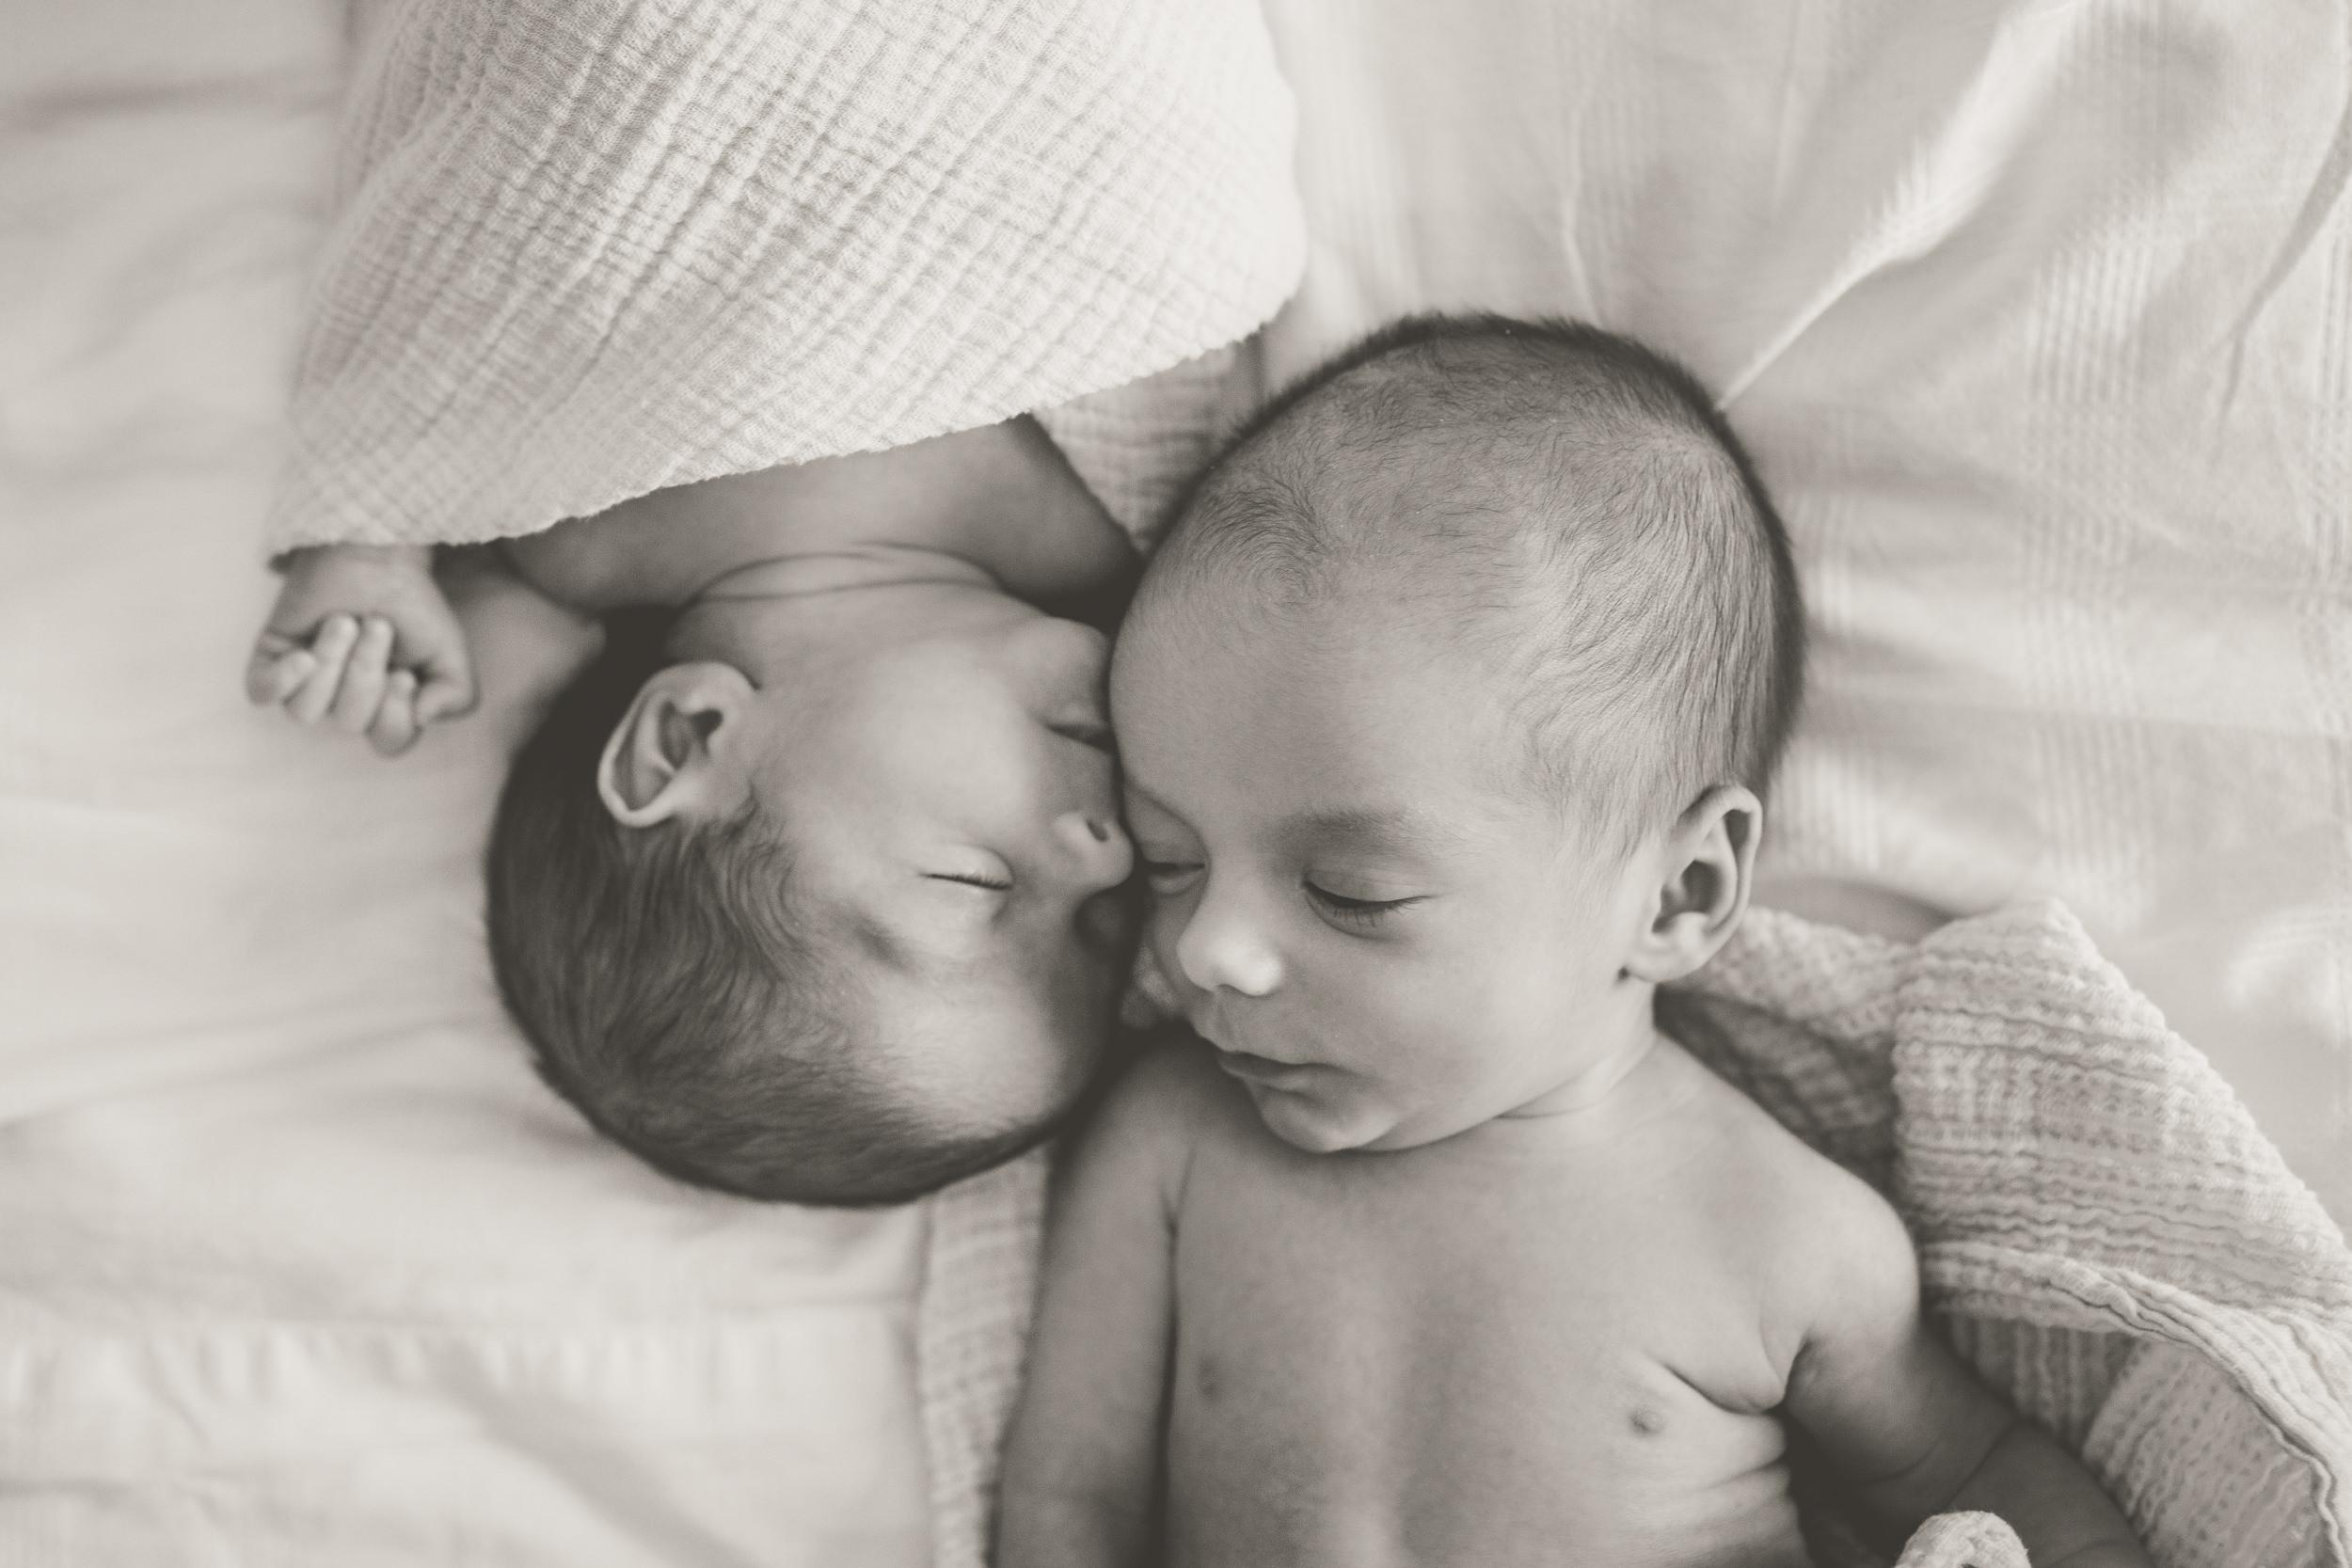 toronto lifestyle photographer ten2tenphotography 55 - Toronto Newborn Twin Photographer